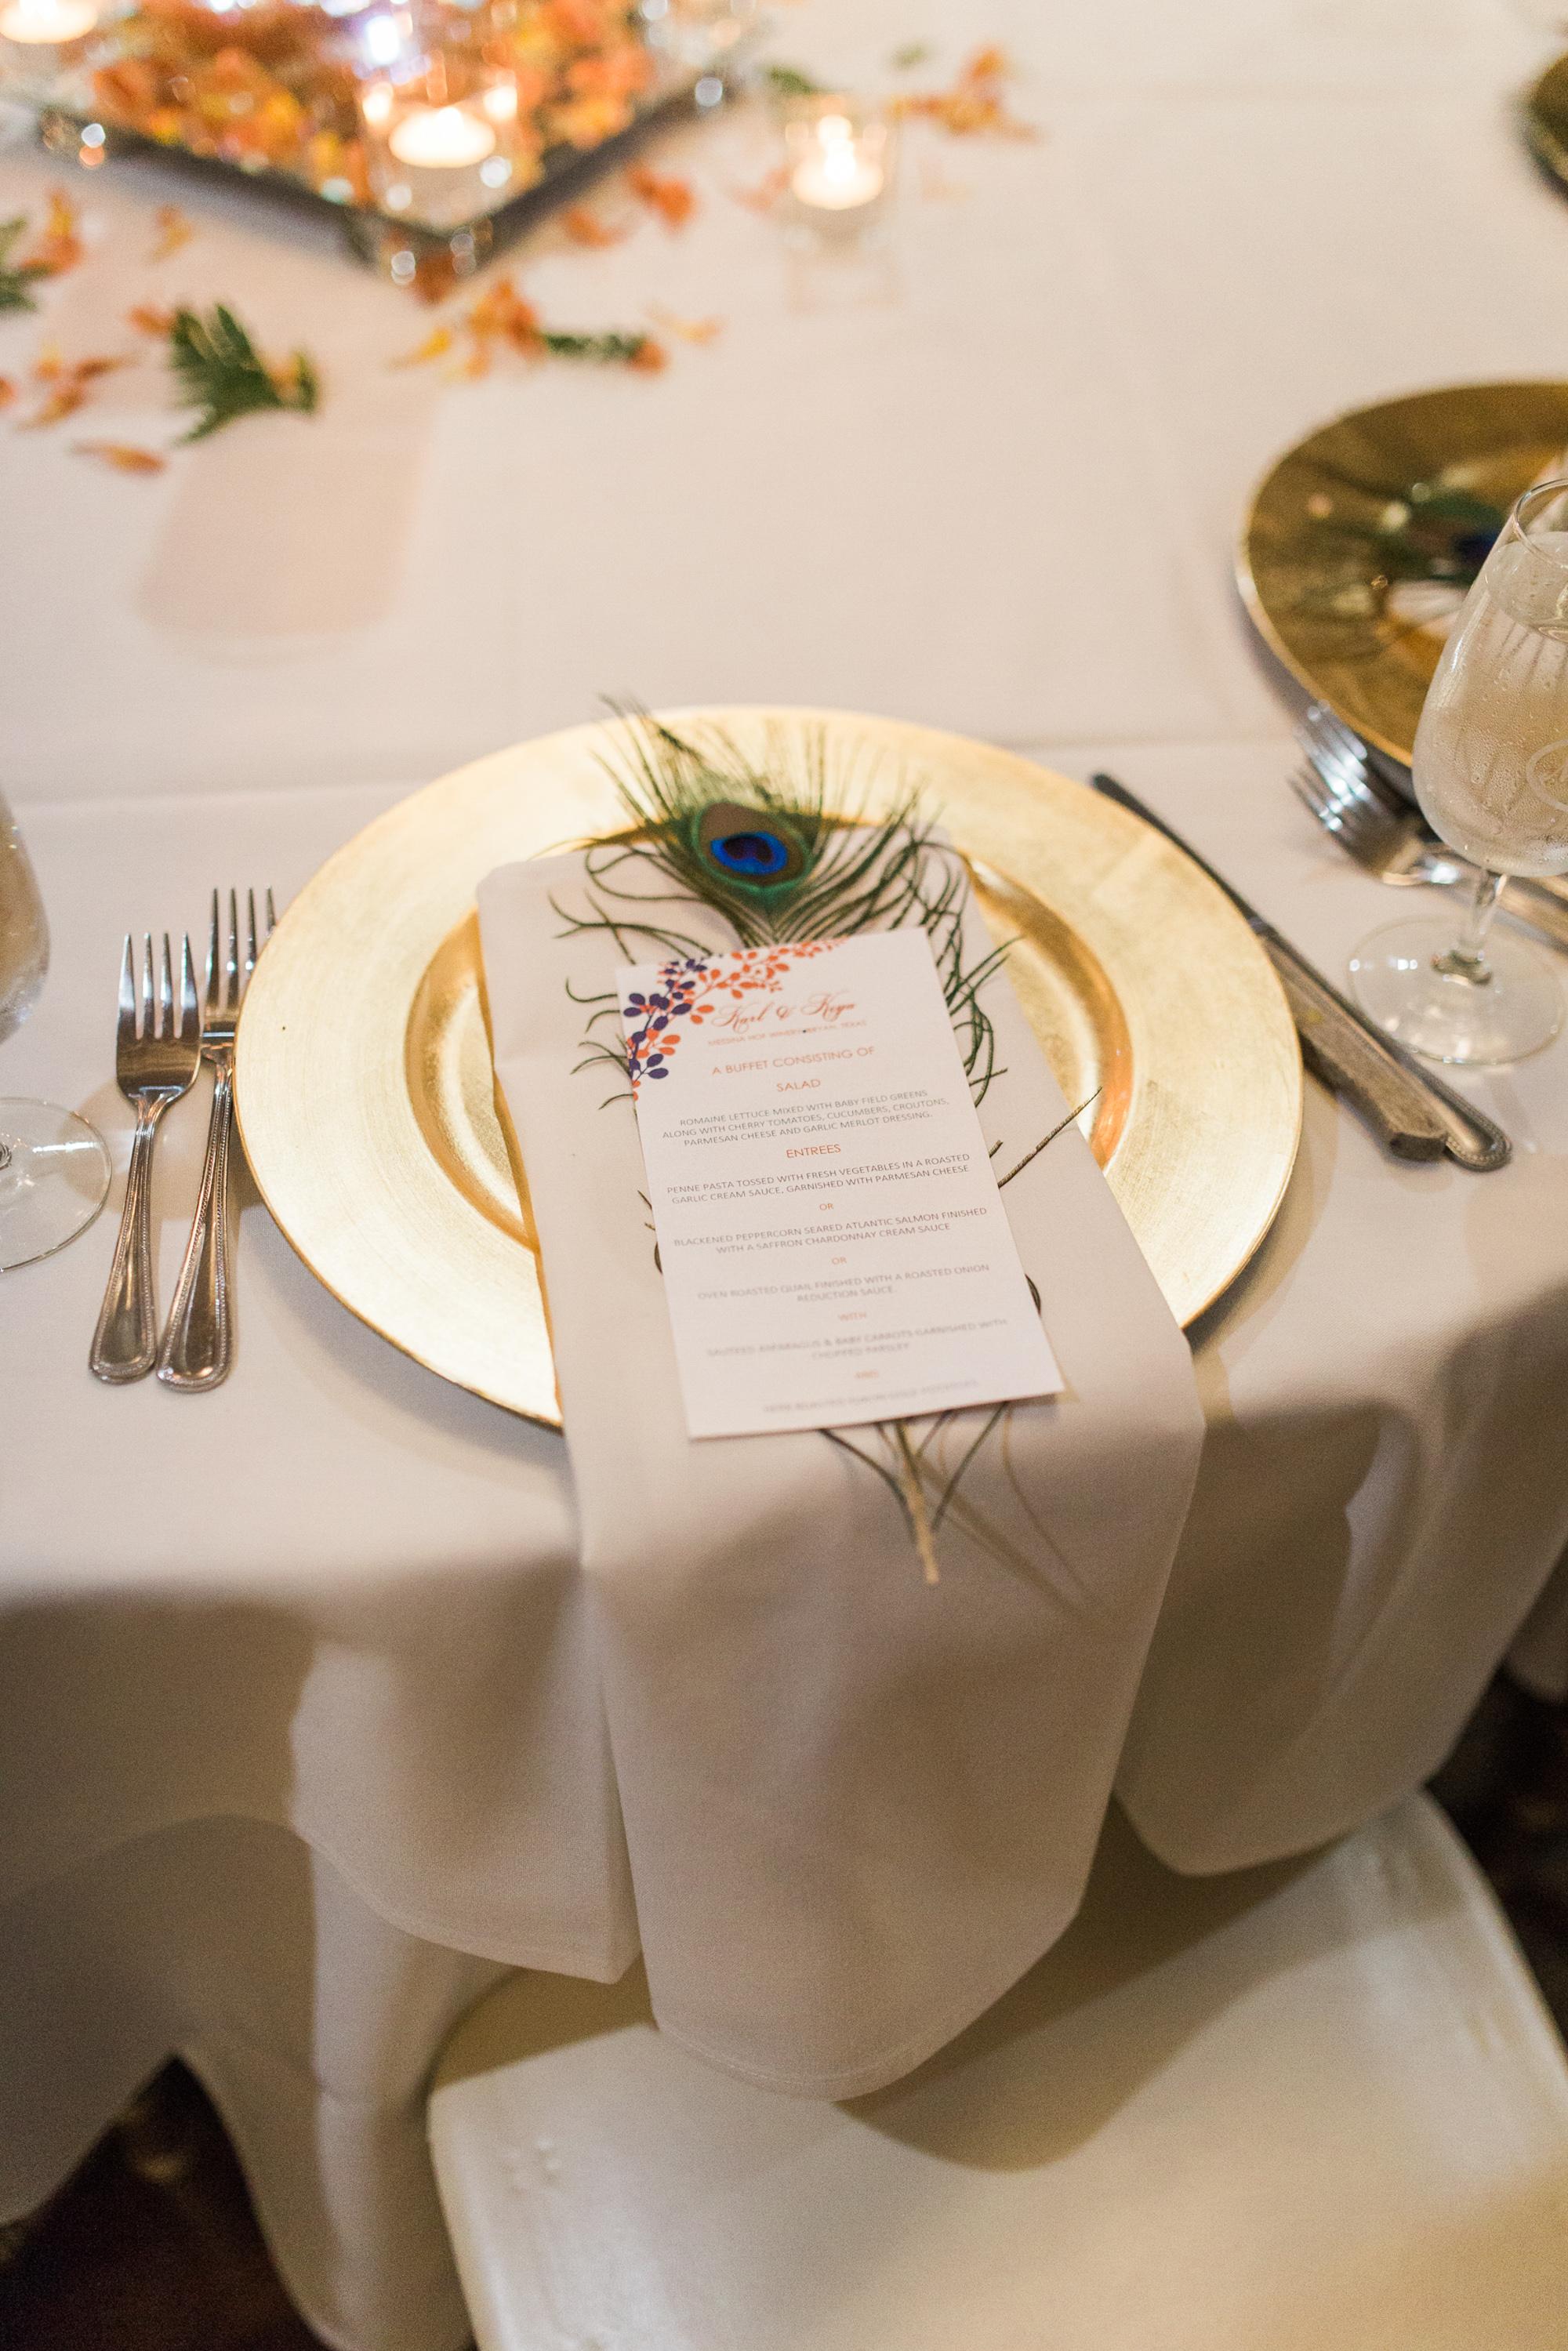 2aab1-messina-hof-wedding-51messina-hof-wedding-51.jpg